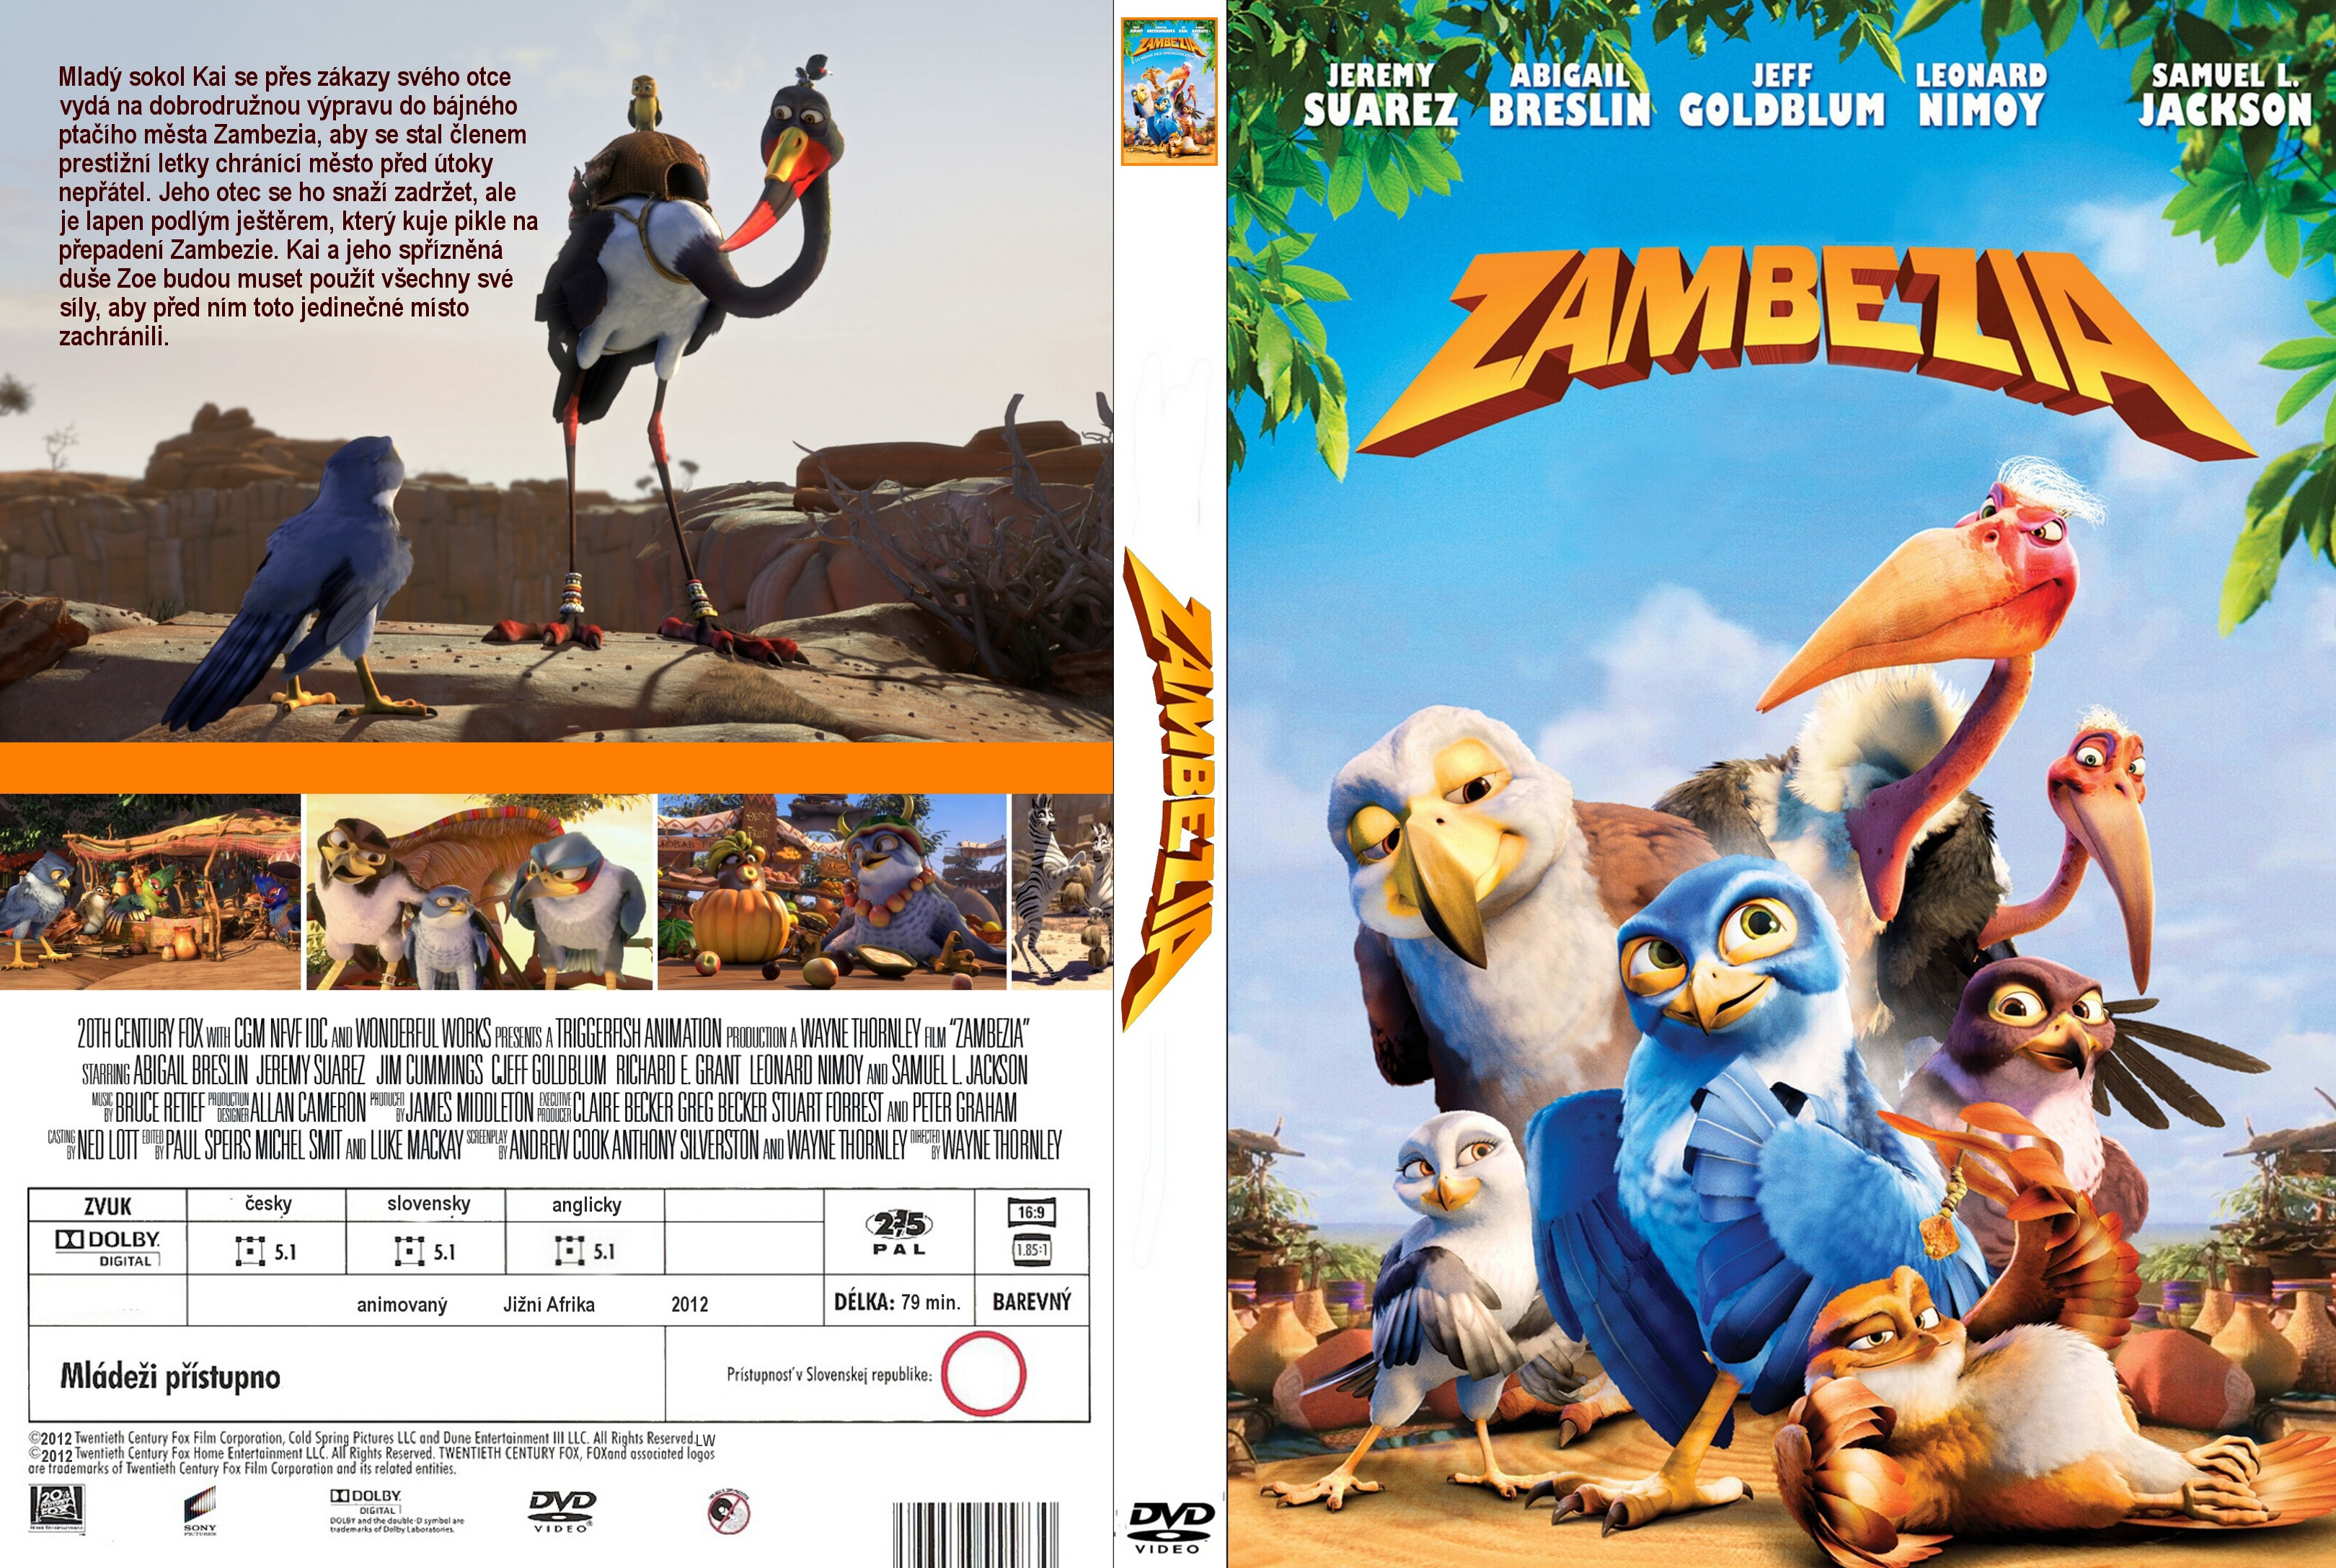 Zambezia full movie youtube.